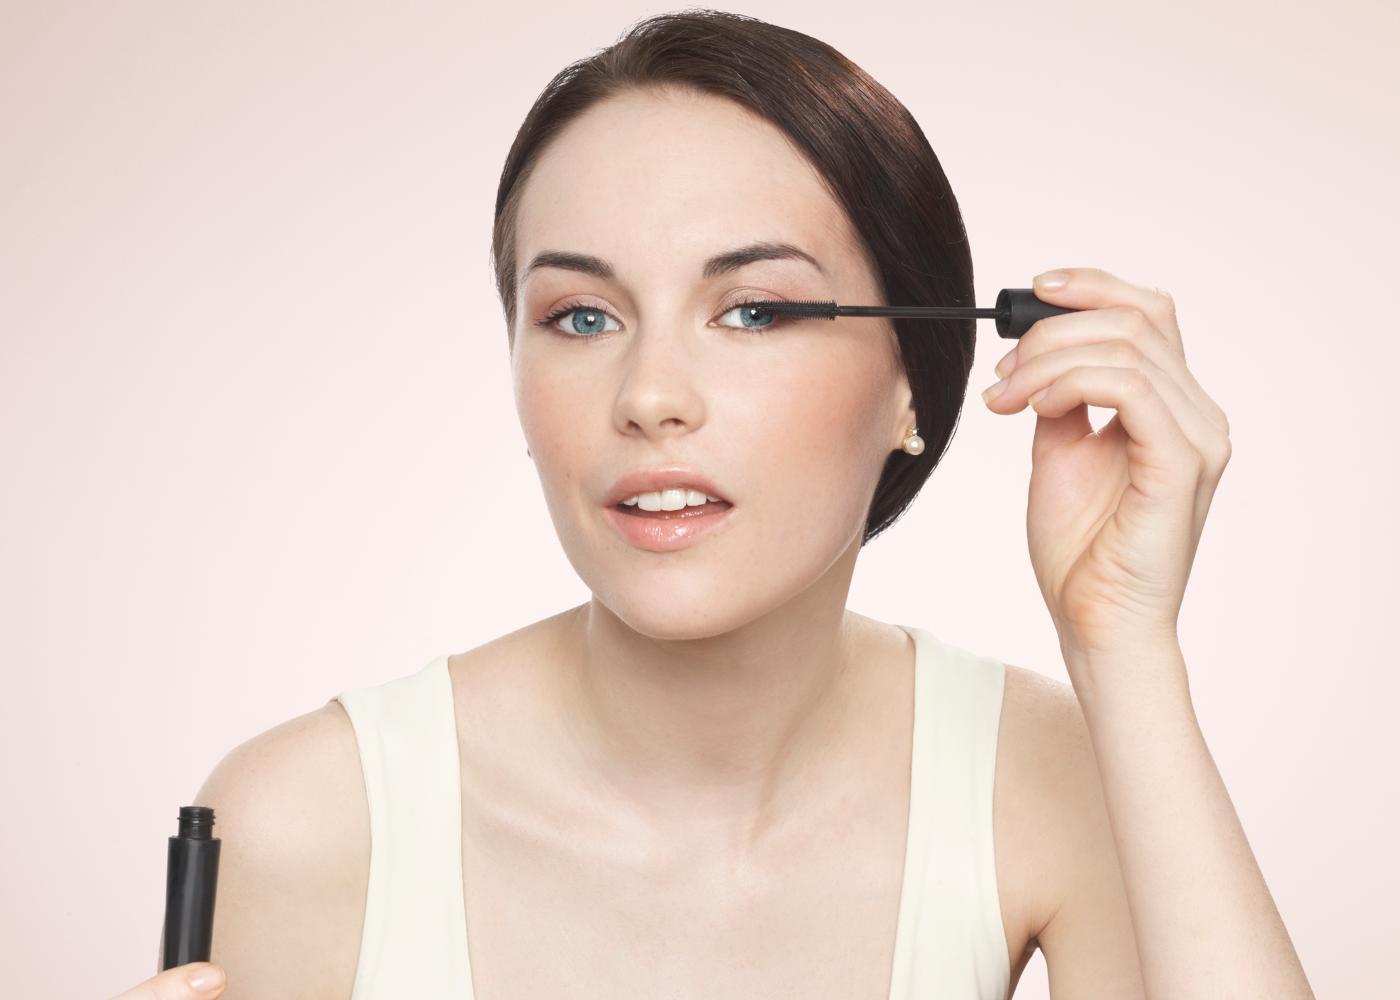 Mulher a aplicar produtos de beleza